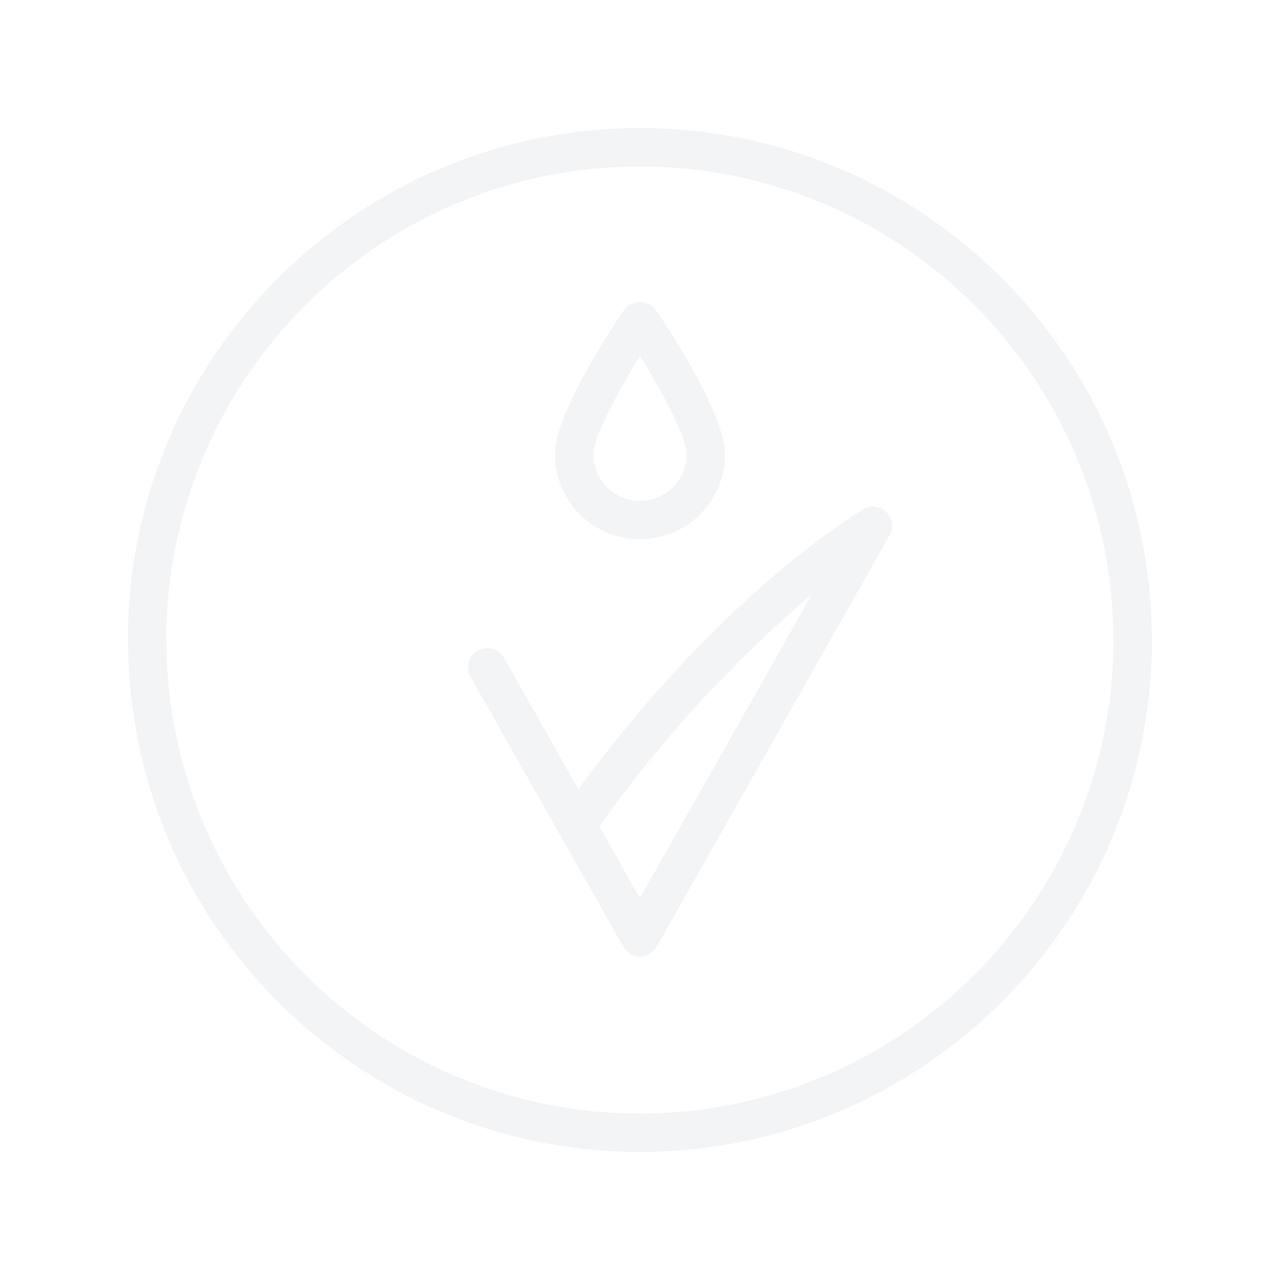 MIZON Joyful Time Essence Snail Mask 23g